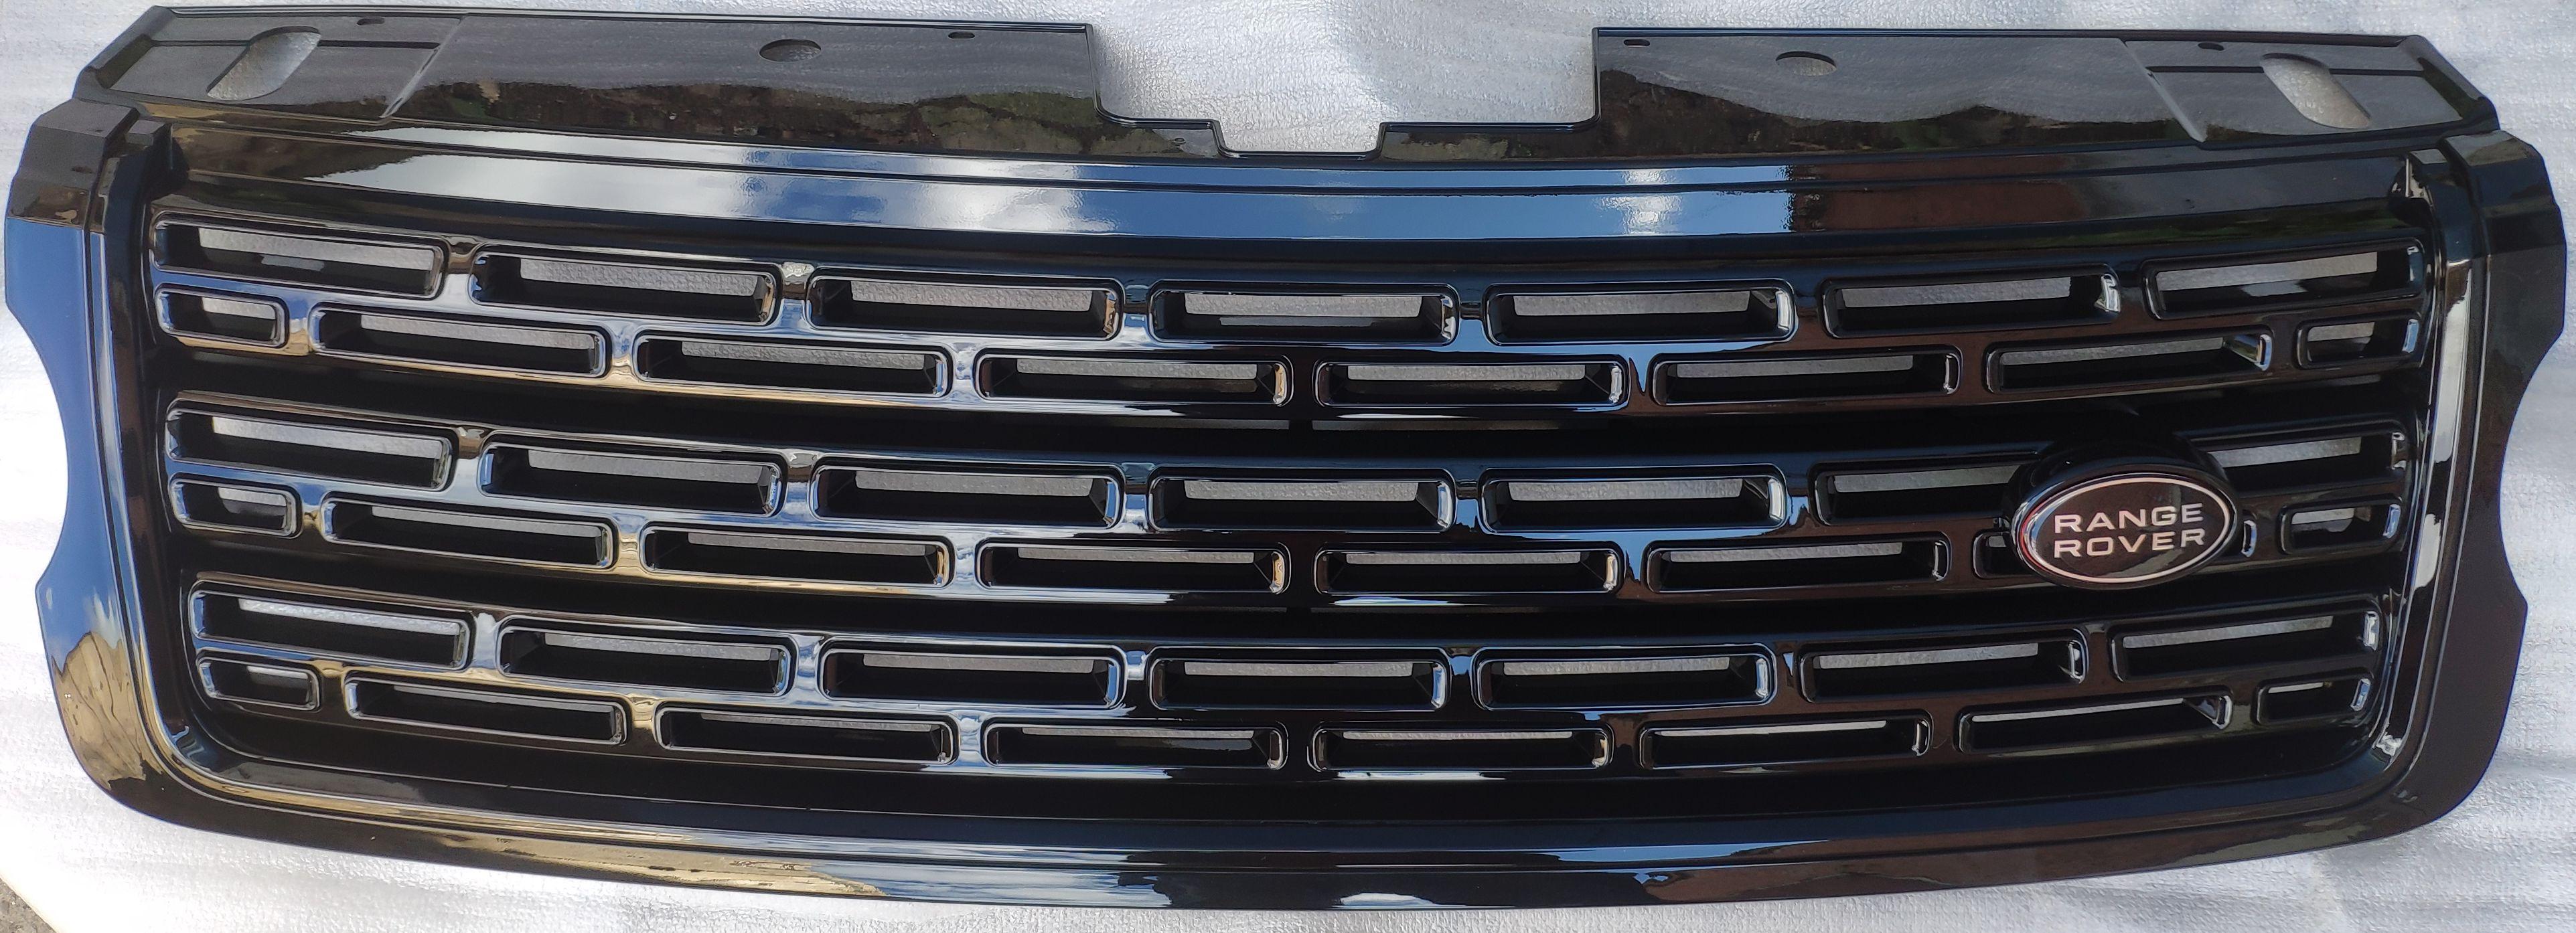 Решетка радиатора Range Rover Vogue L405 BLACK